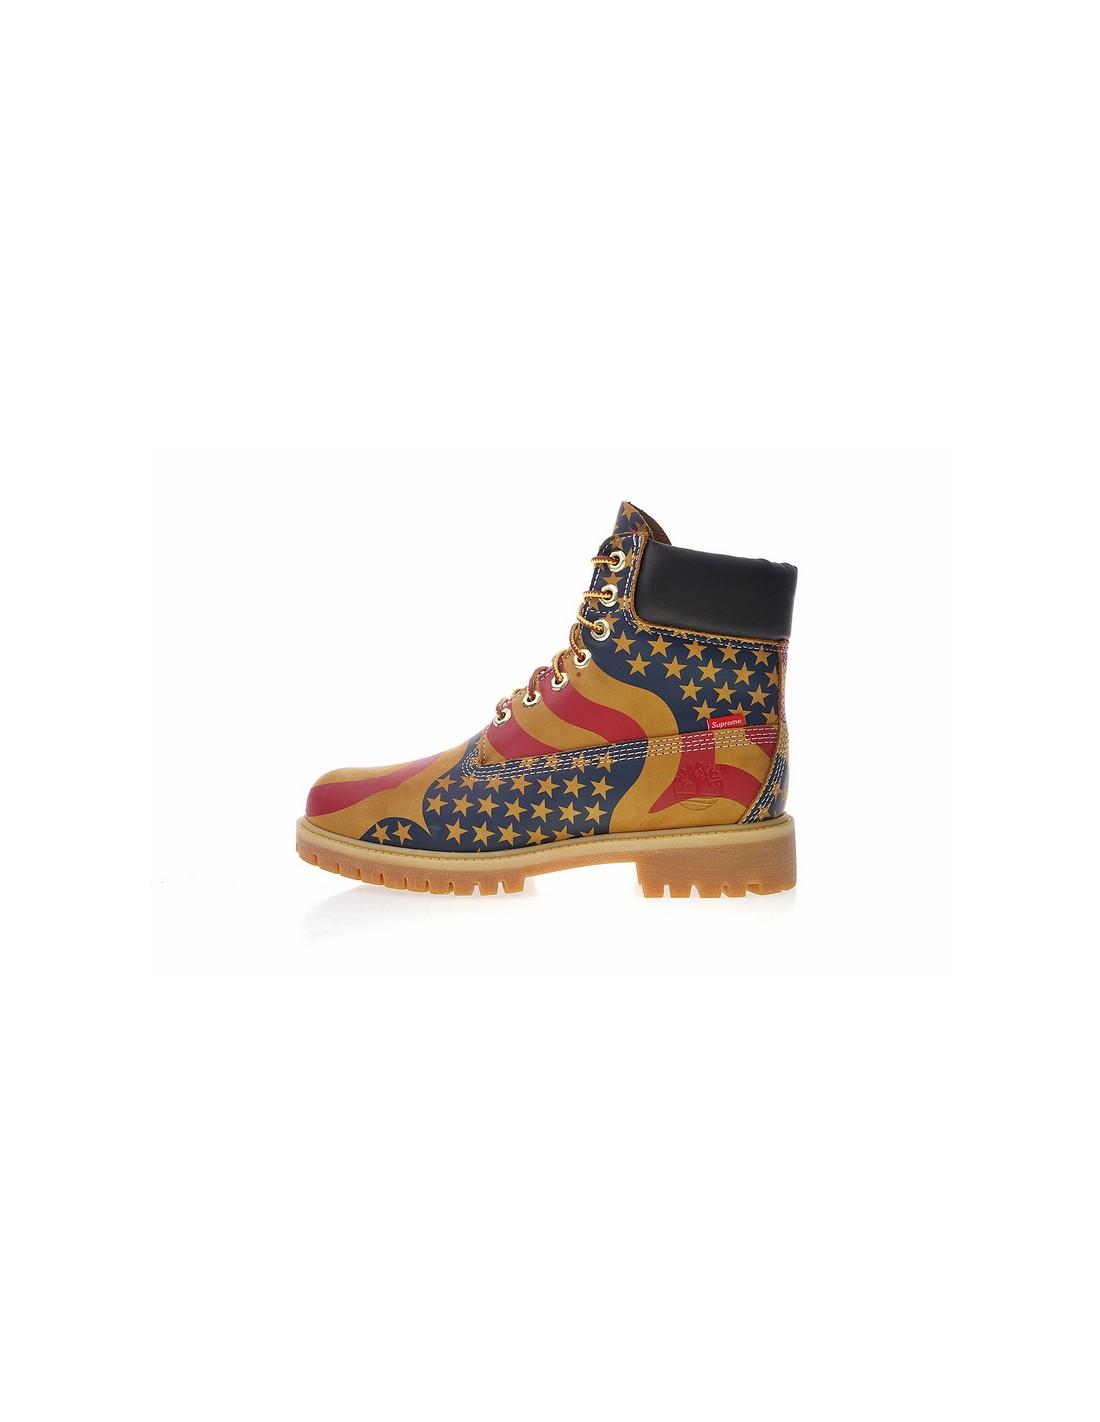 "Timberland 6 Inch Premium Waterproof Boot x Supreme ""USA"" Men s Shoe 800340a13"